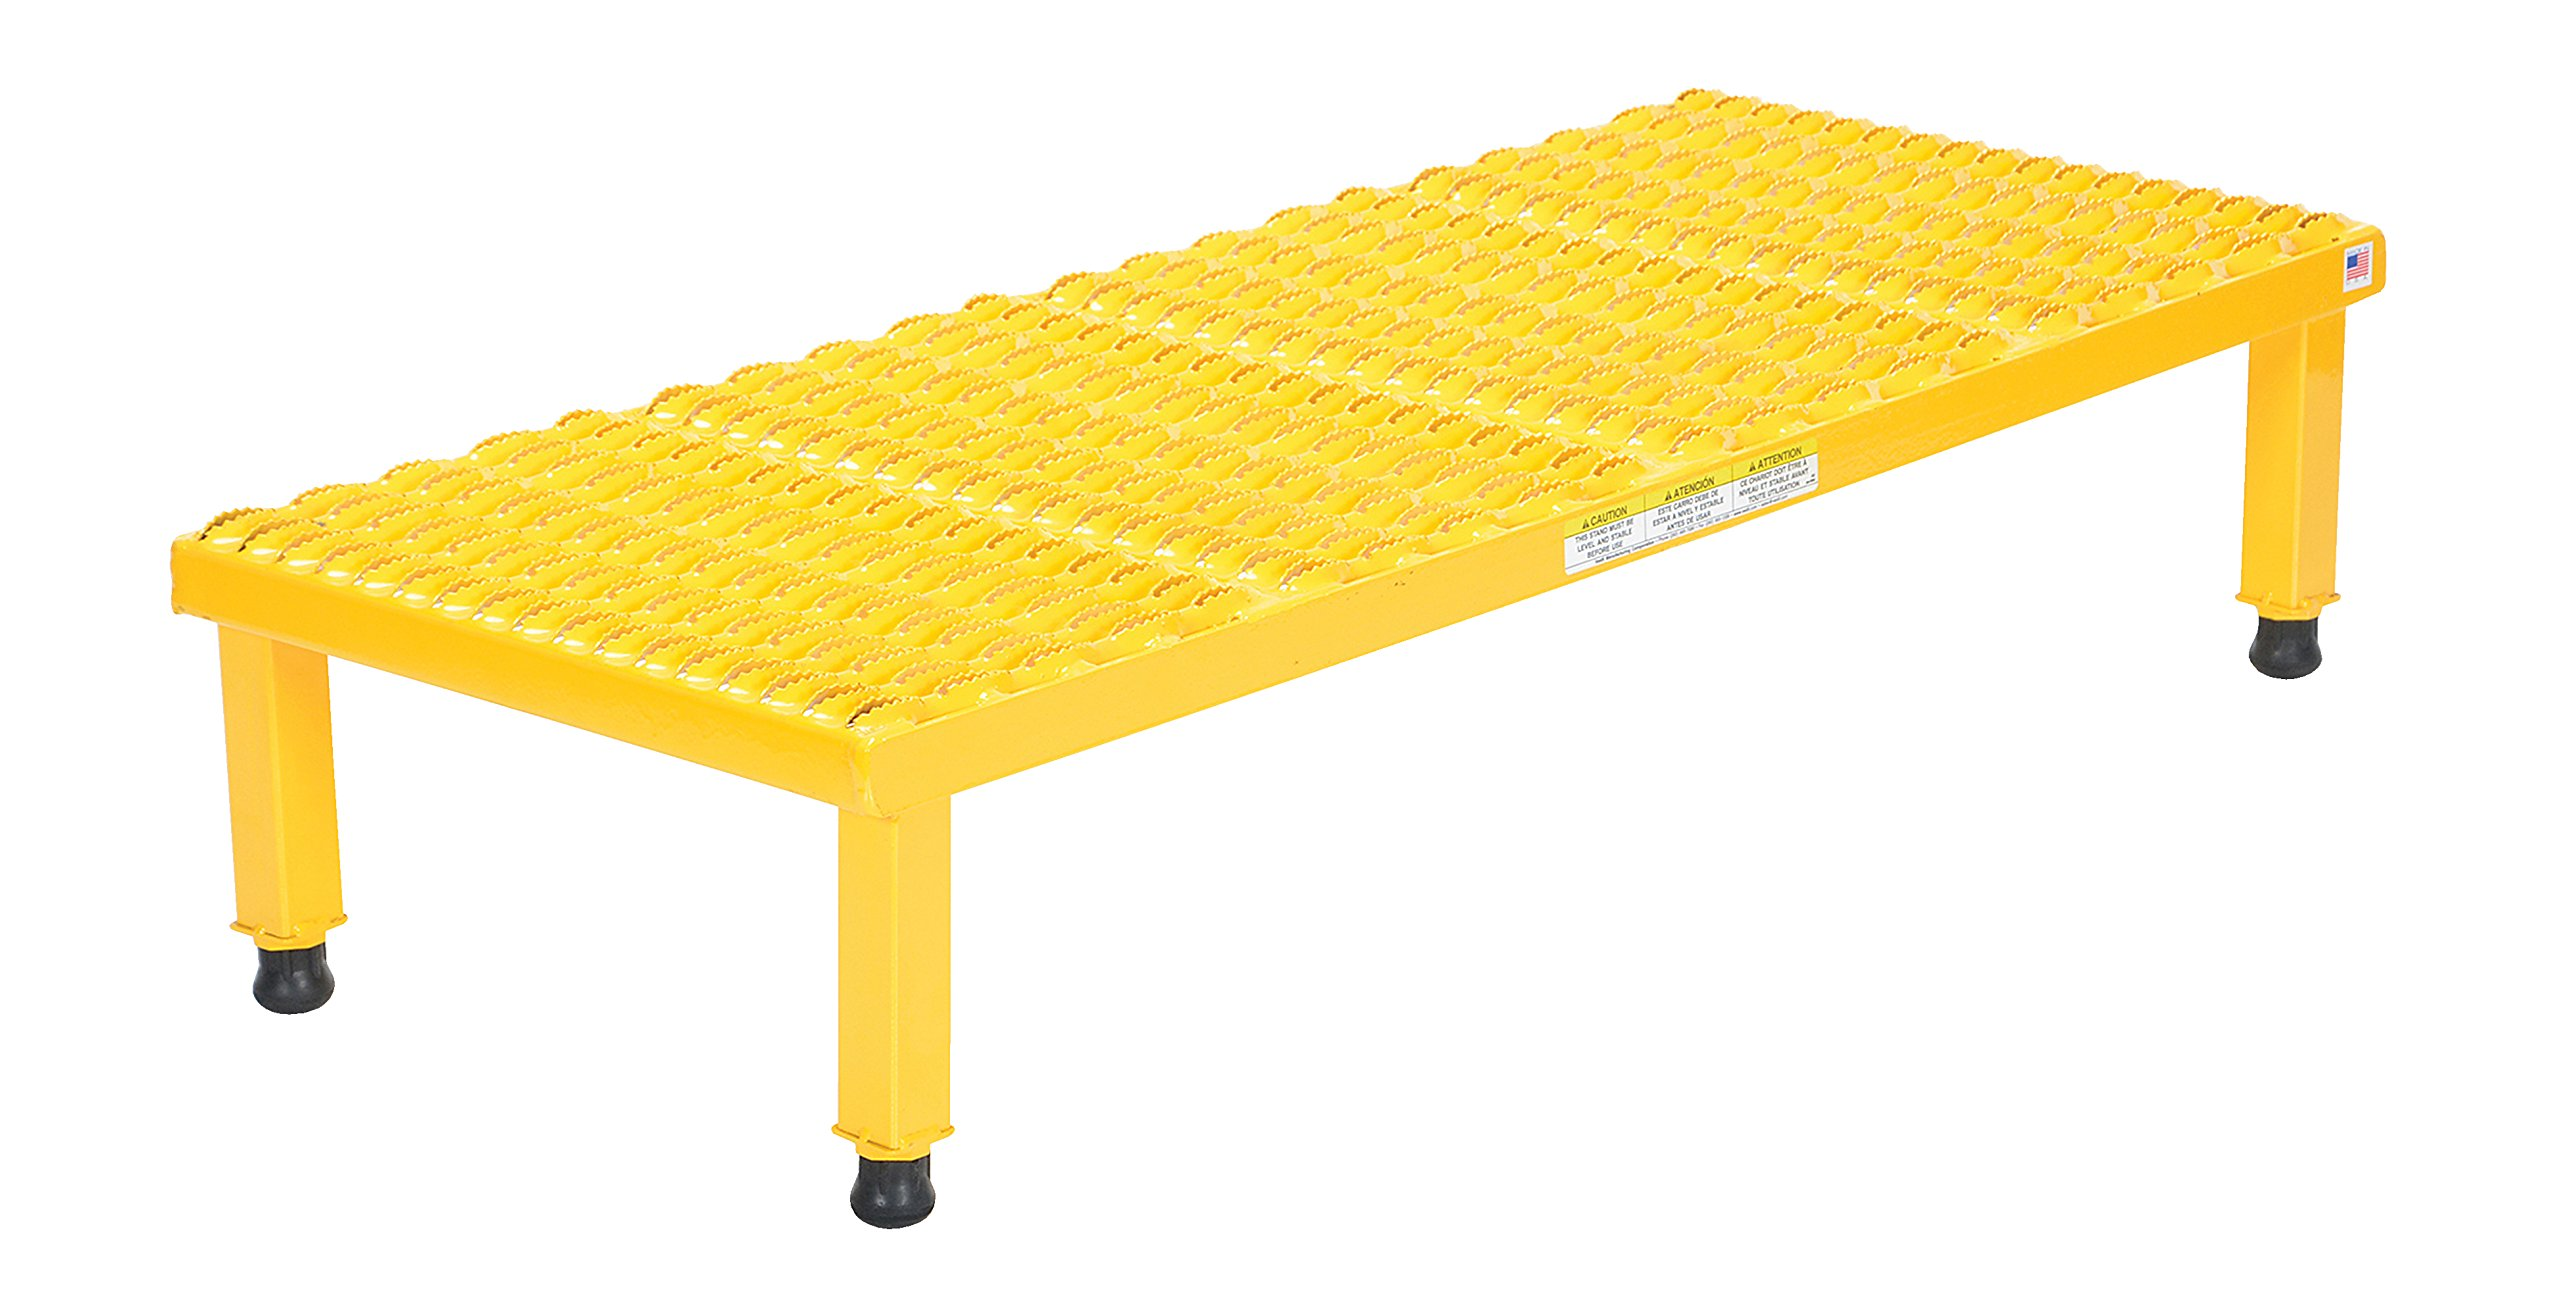 Vestil AHW-H-1948 Adjustable Work-Mate Stand with Serrated Deck, Steel, 48'' Length x 19'' Width Deck, 500 lbs Capacity, 9'' - 14'' Height Range